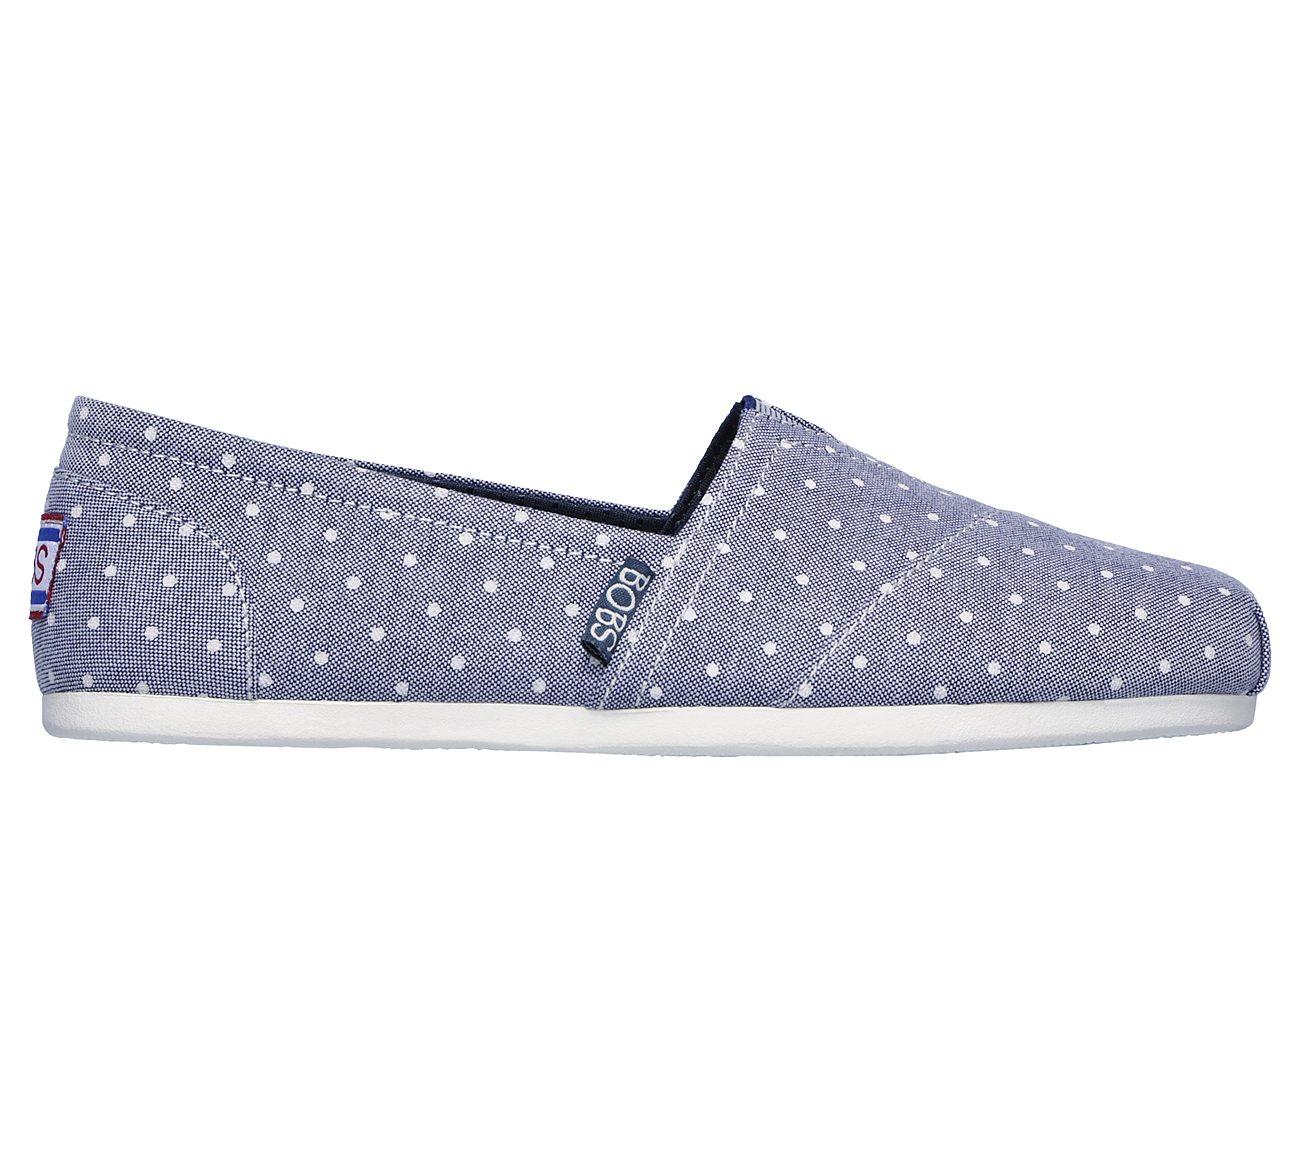 SKECHERS BOBS Plush - Hot Spot BOBS Shoes